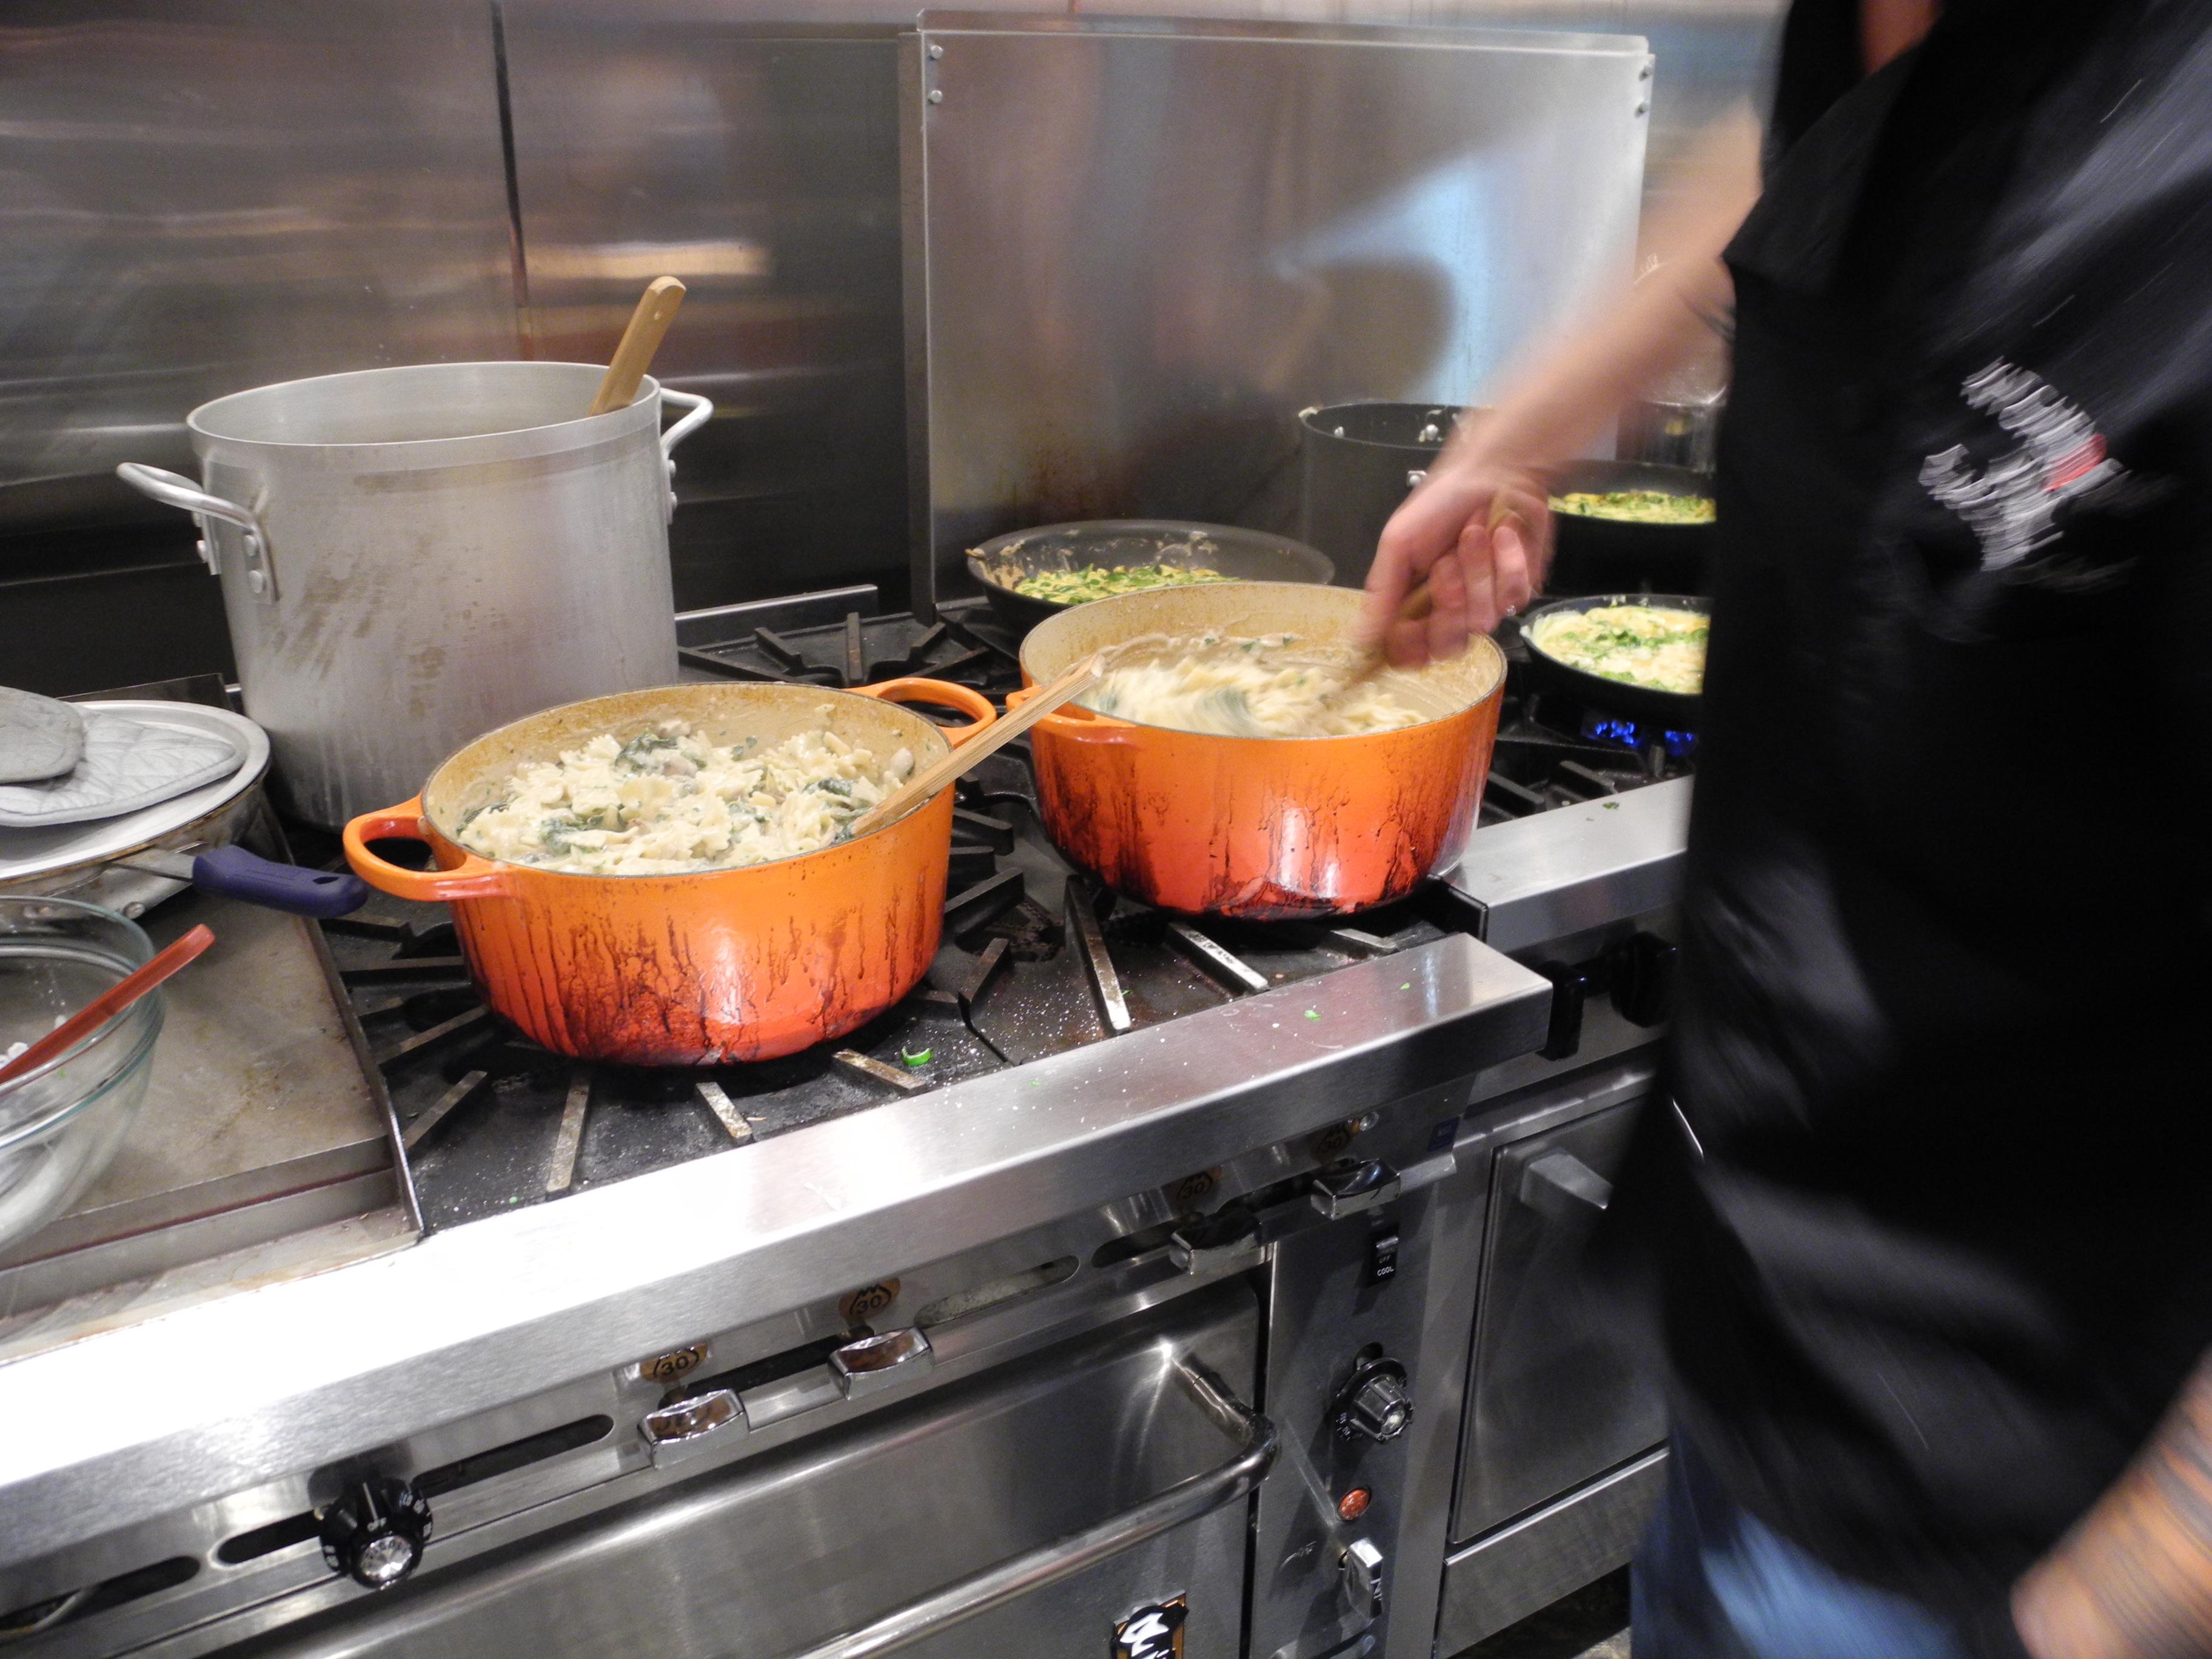 Kitchen on Fire: Cooking Classes in Berkeley   wayfaring amanda